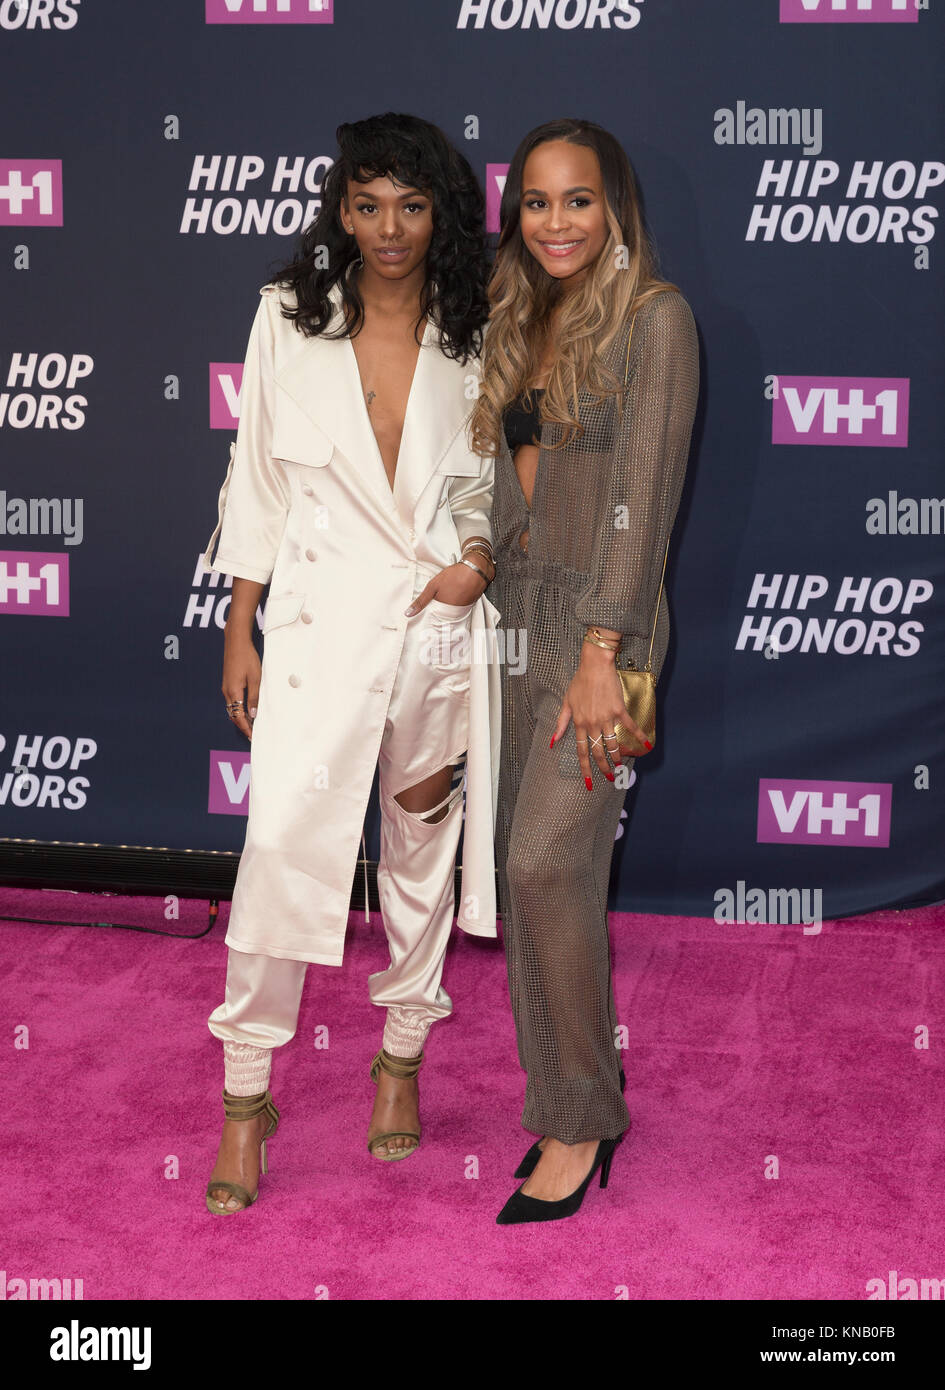 New York, NY - 11. Juli 2016: Elisa Johnson, Samaria Leah Smith besuchen 2016 VH1 Hip Hop Honors: All hail The Queens Stockbild